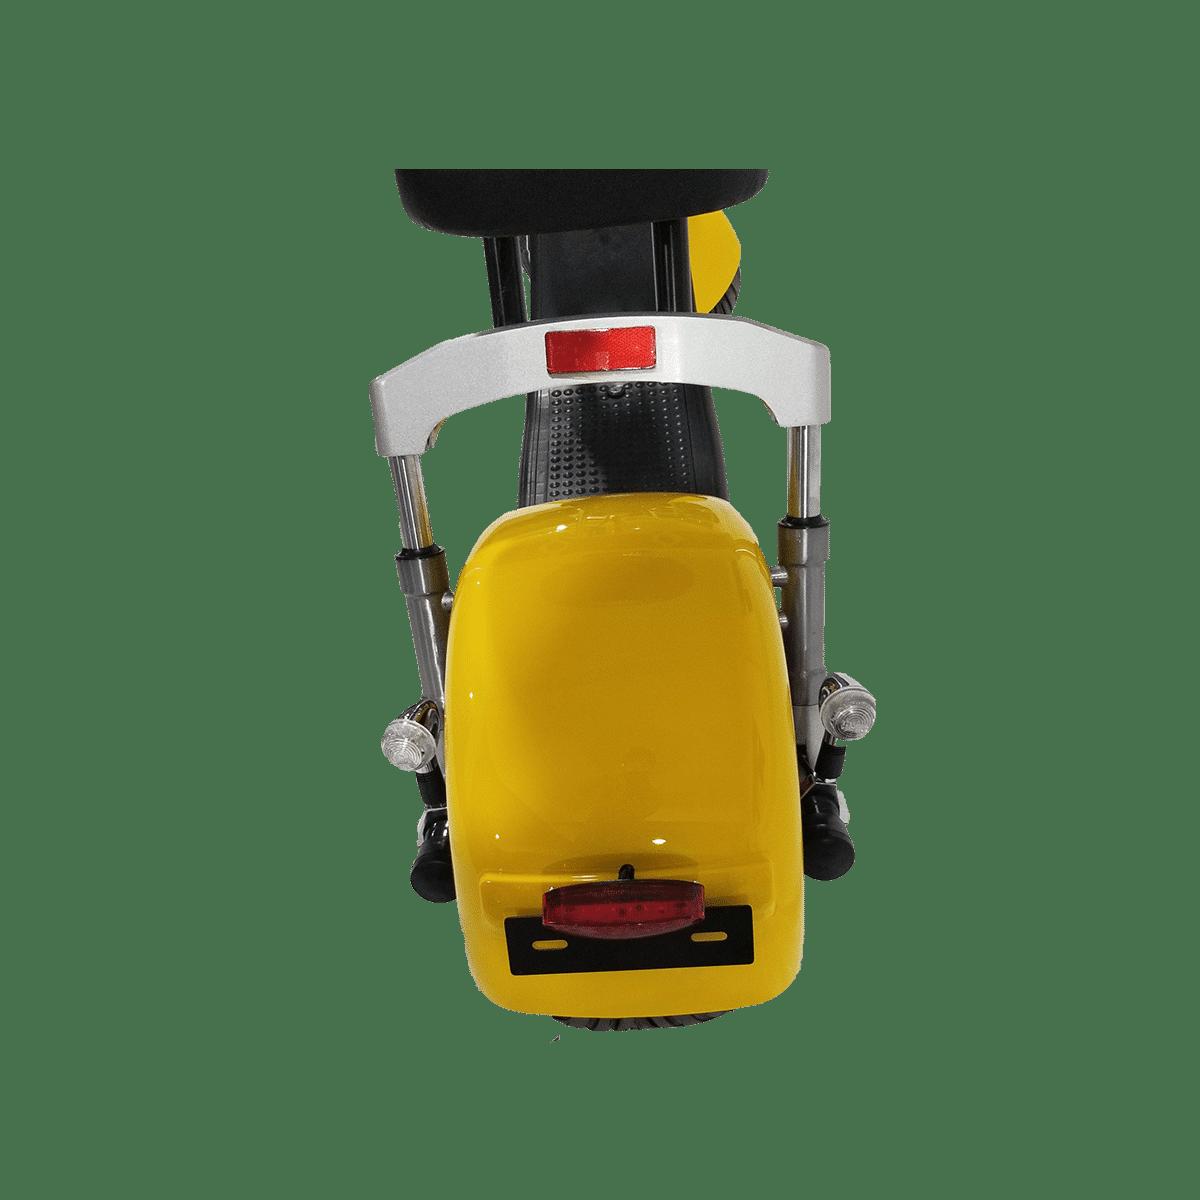 Citycoco Harley Deluxe Jaune avec 1 batterie offerte en plus 11